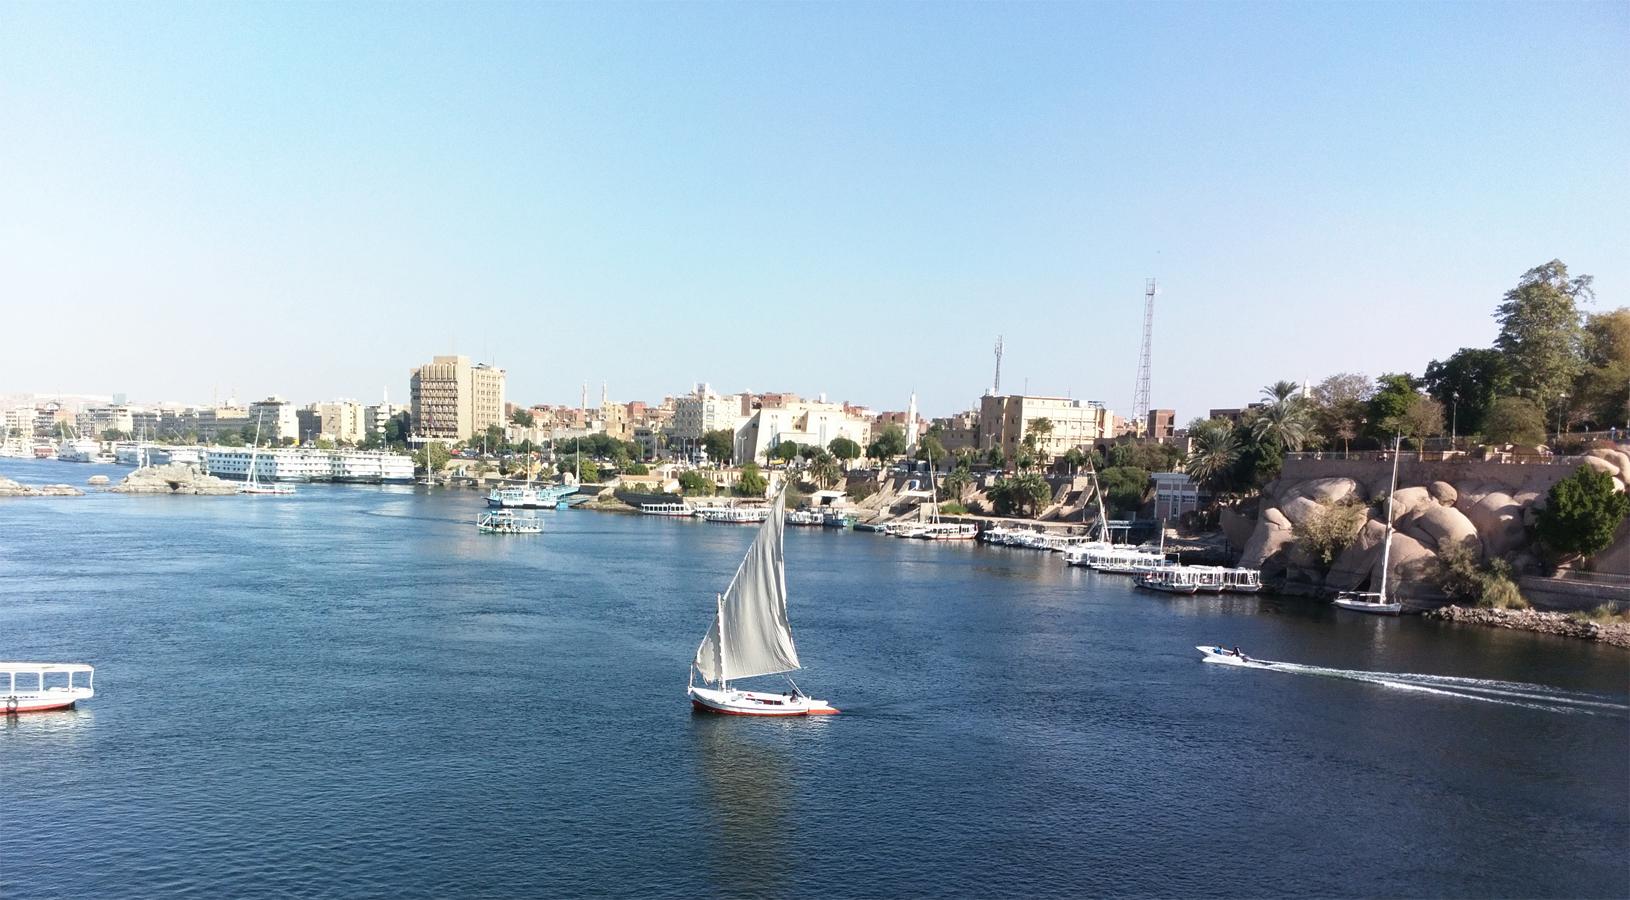 Nile felucca ride to Botanical garden in Aswan